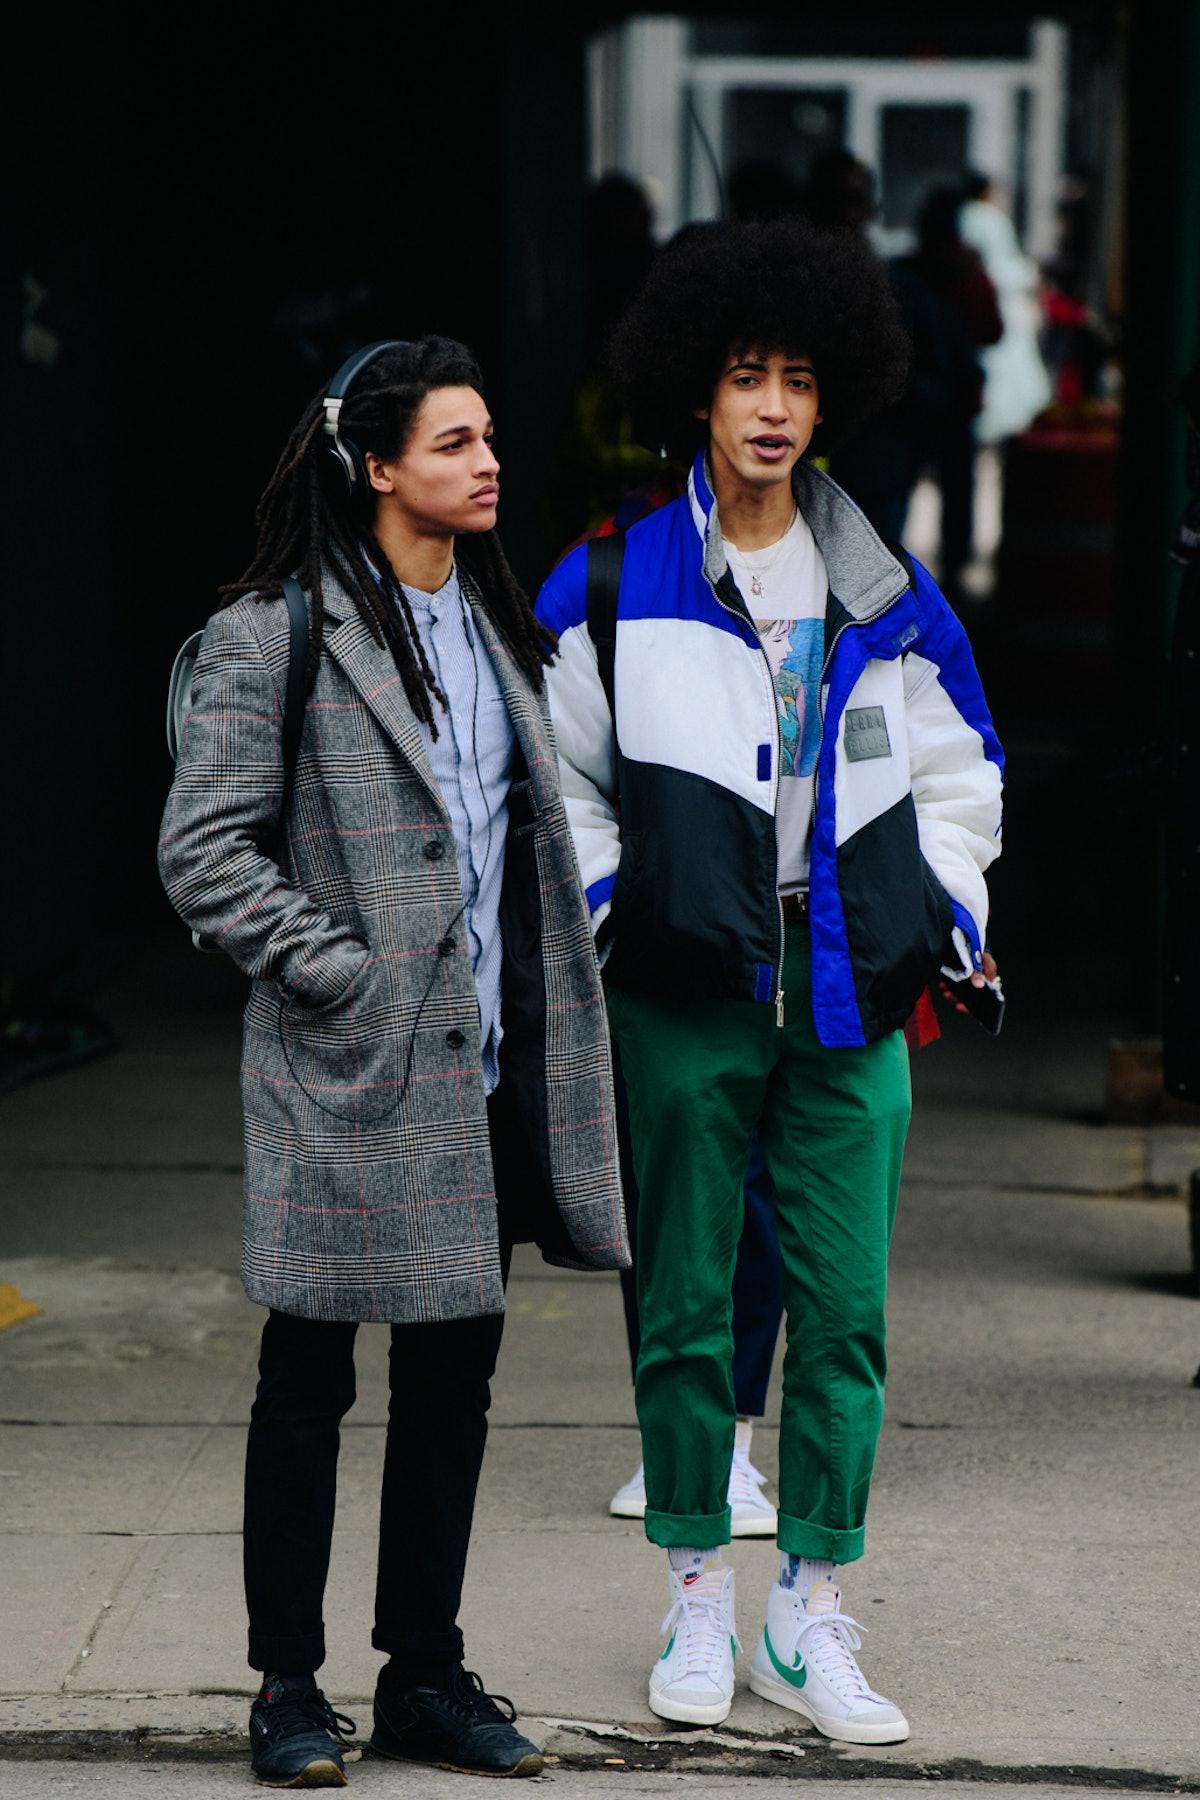 Adam-Katz-Sinding-W-Magazine-New-York-Fashion-Week-Fall-Winter-2019_AKS4548.jpg